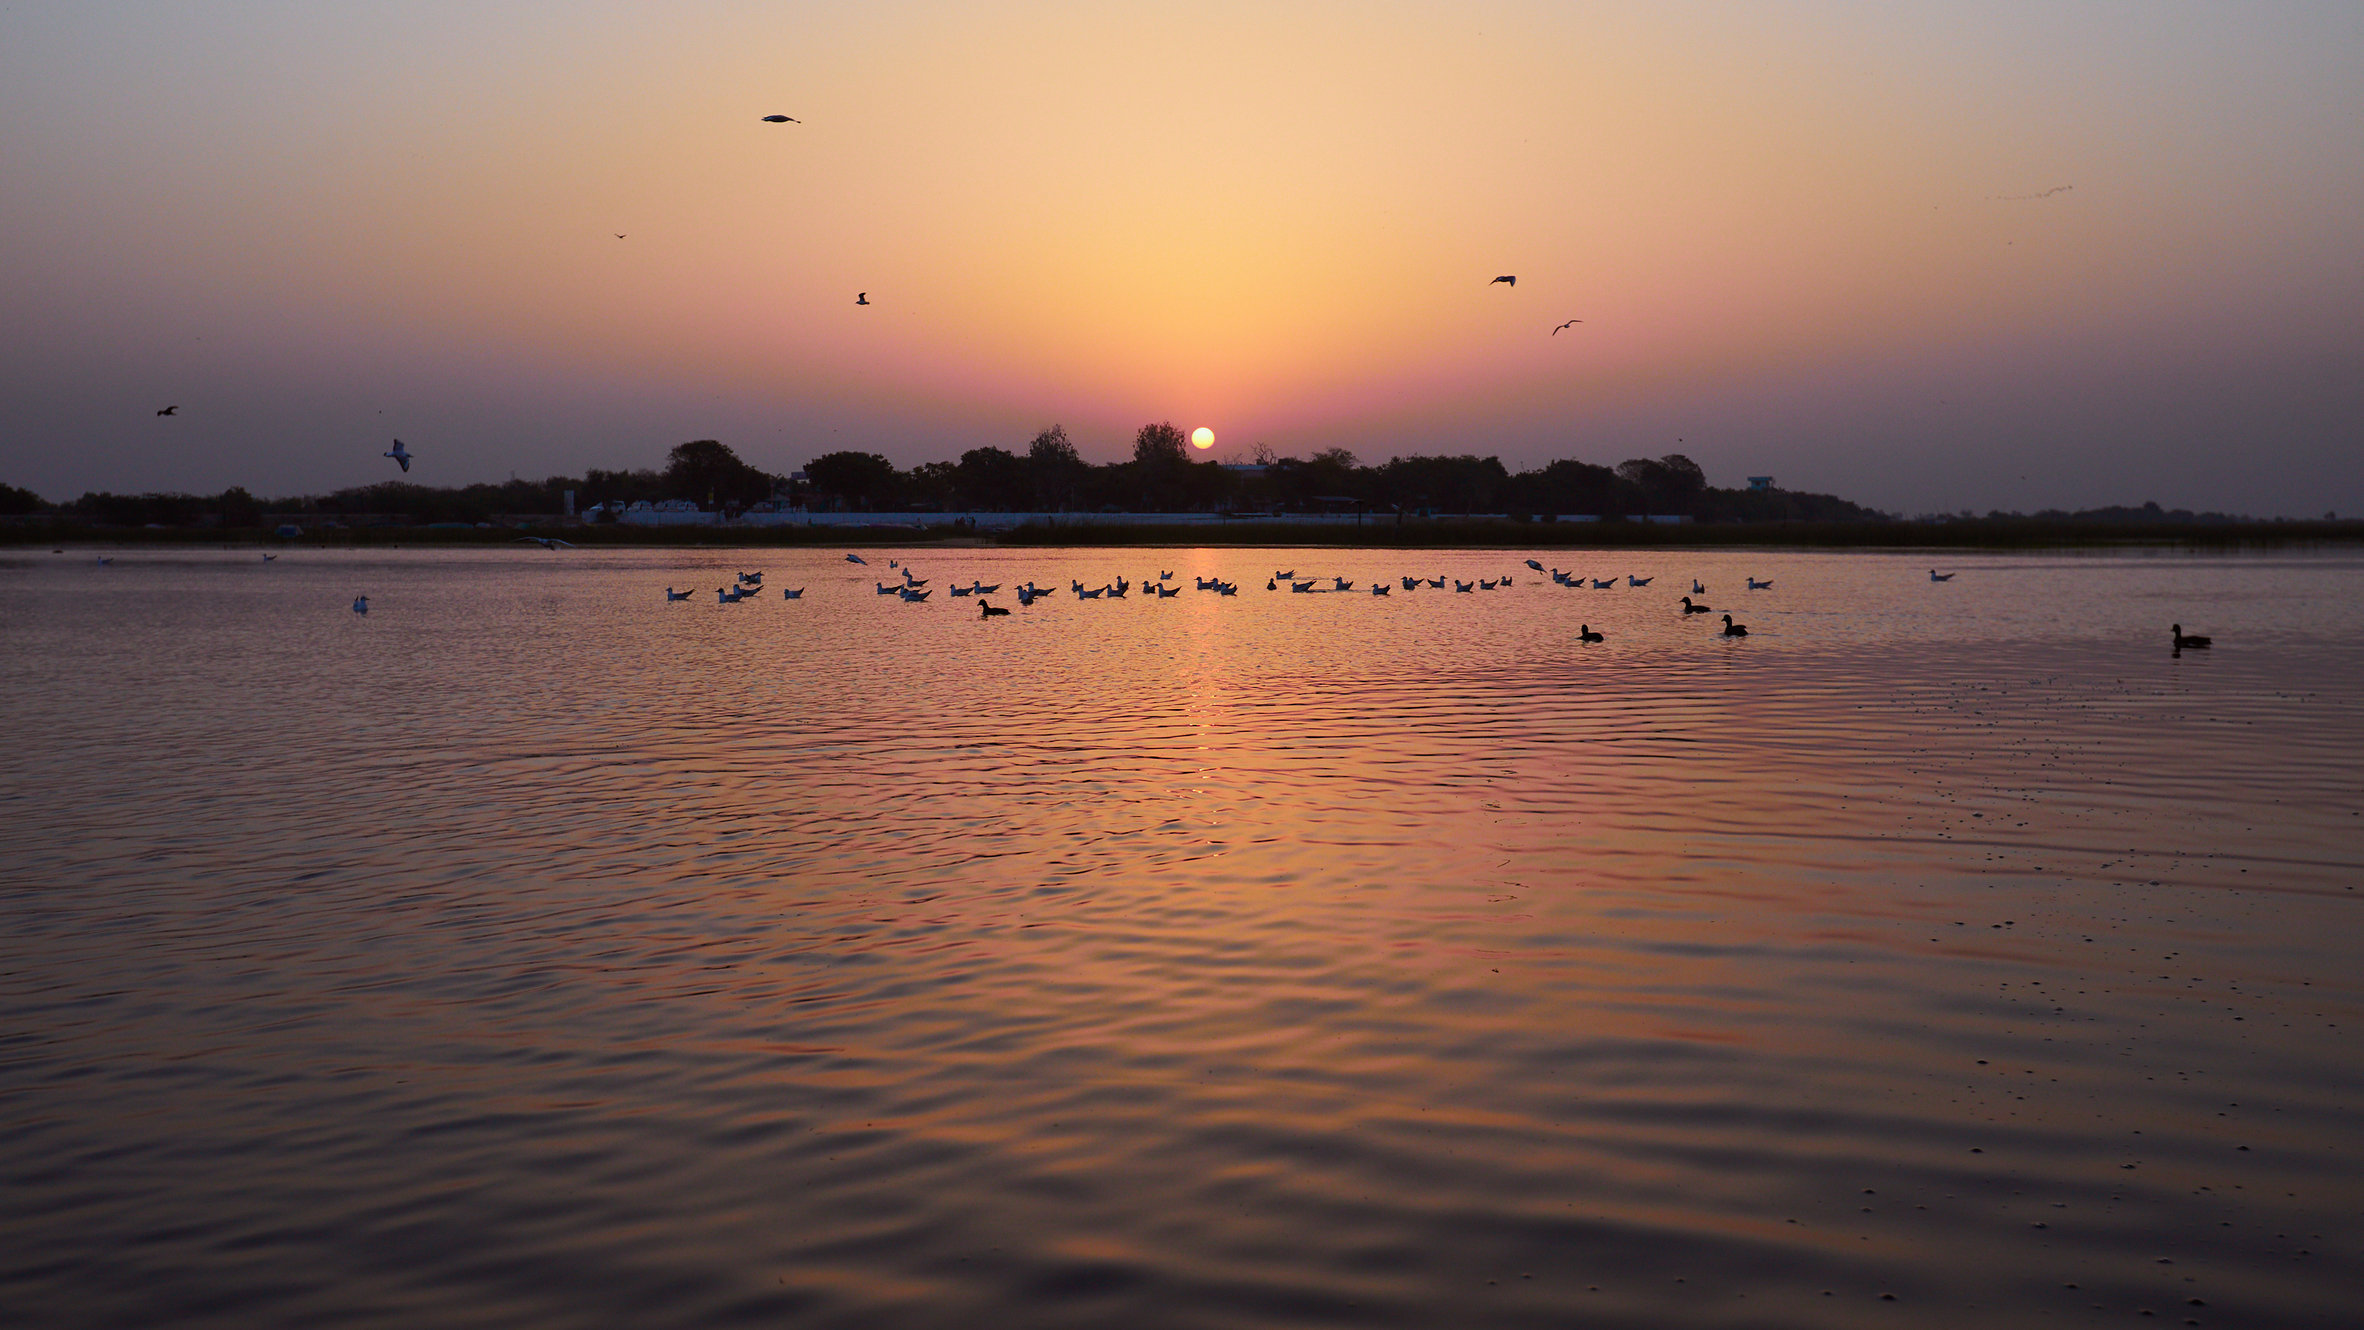 Pranidhi_Day3_Picture1.jpg